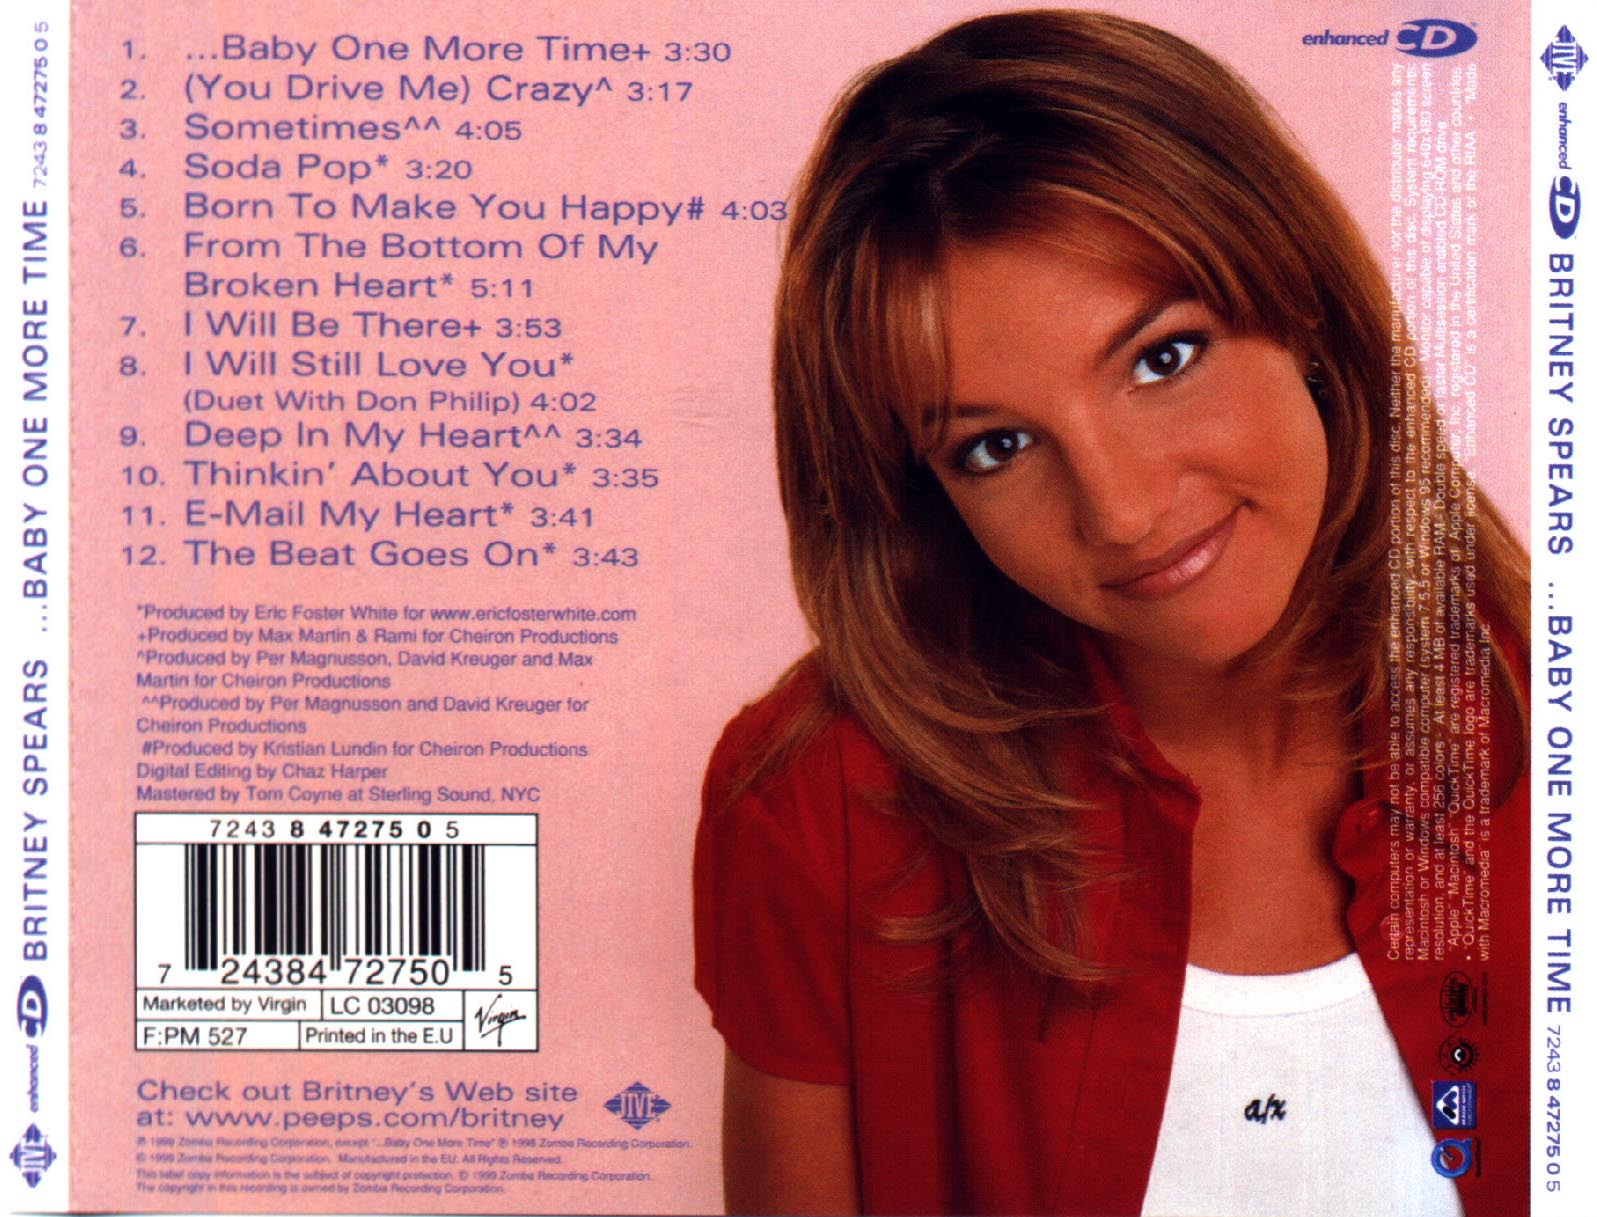 http://2.bp.blogspot.com/_9hpmRuuWki0/TNQ06xUQ_dI/AAAAAAAAAek/uDeHxszzQnk/s1600/Britney_Spears-Baby_One_More_Time-Trasera.jpg